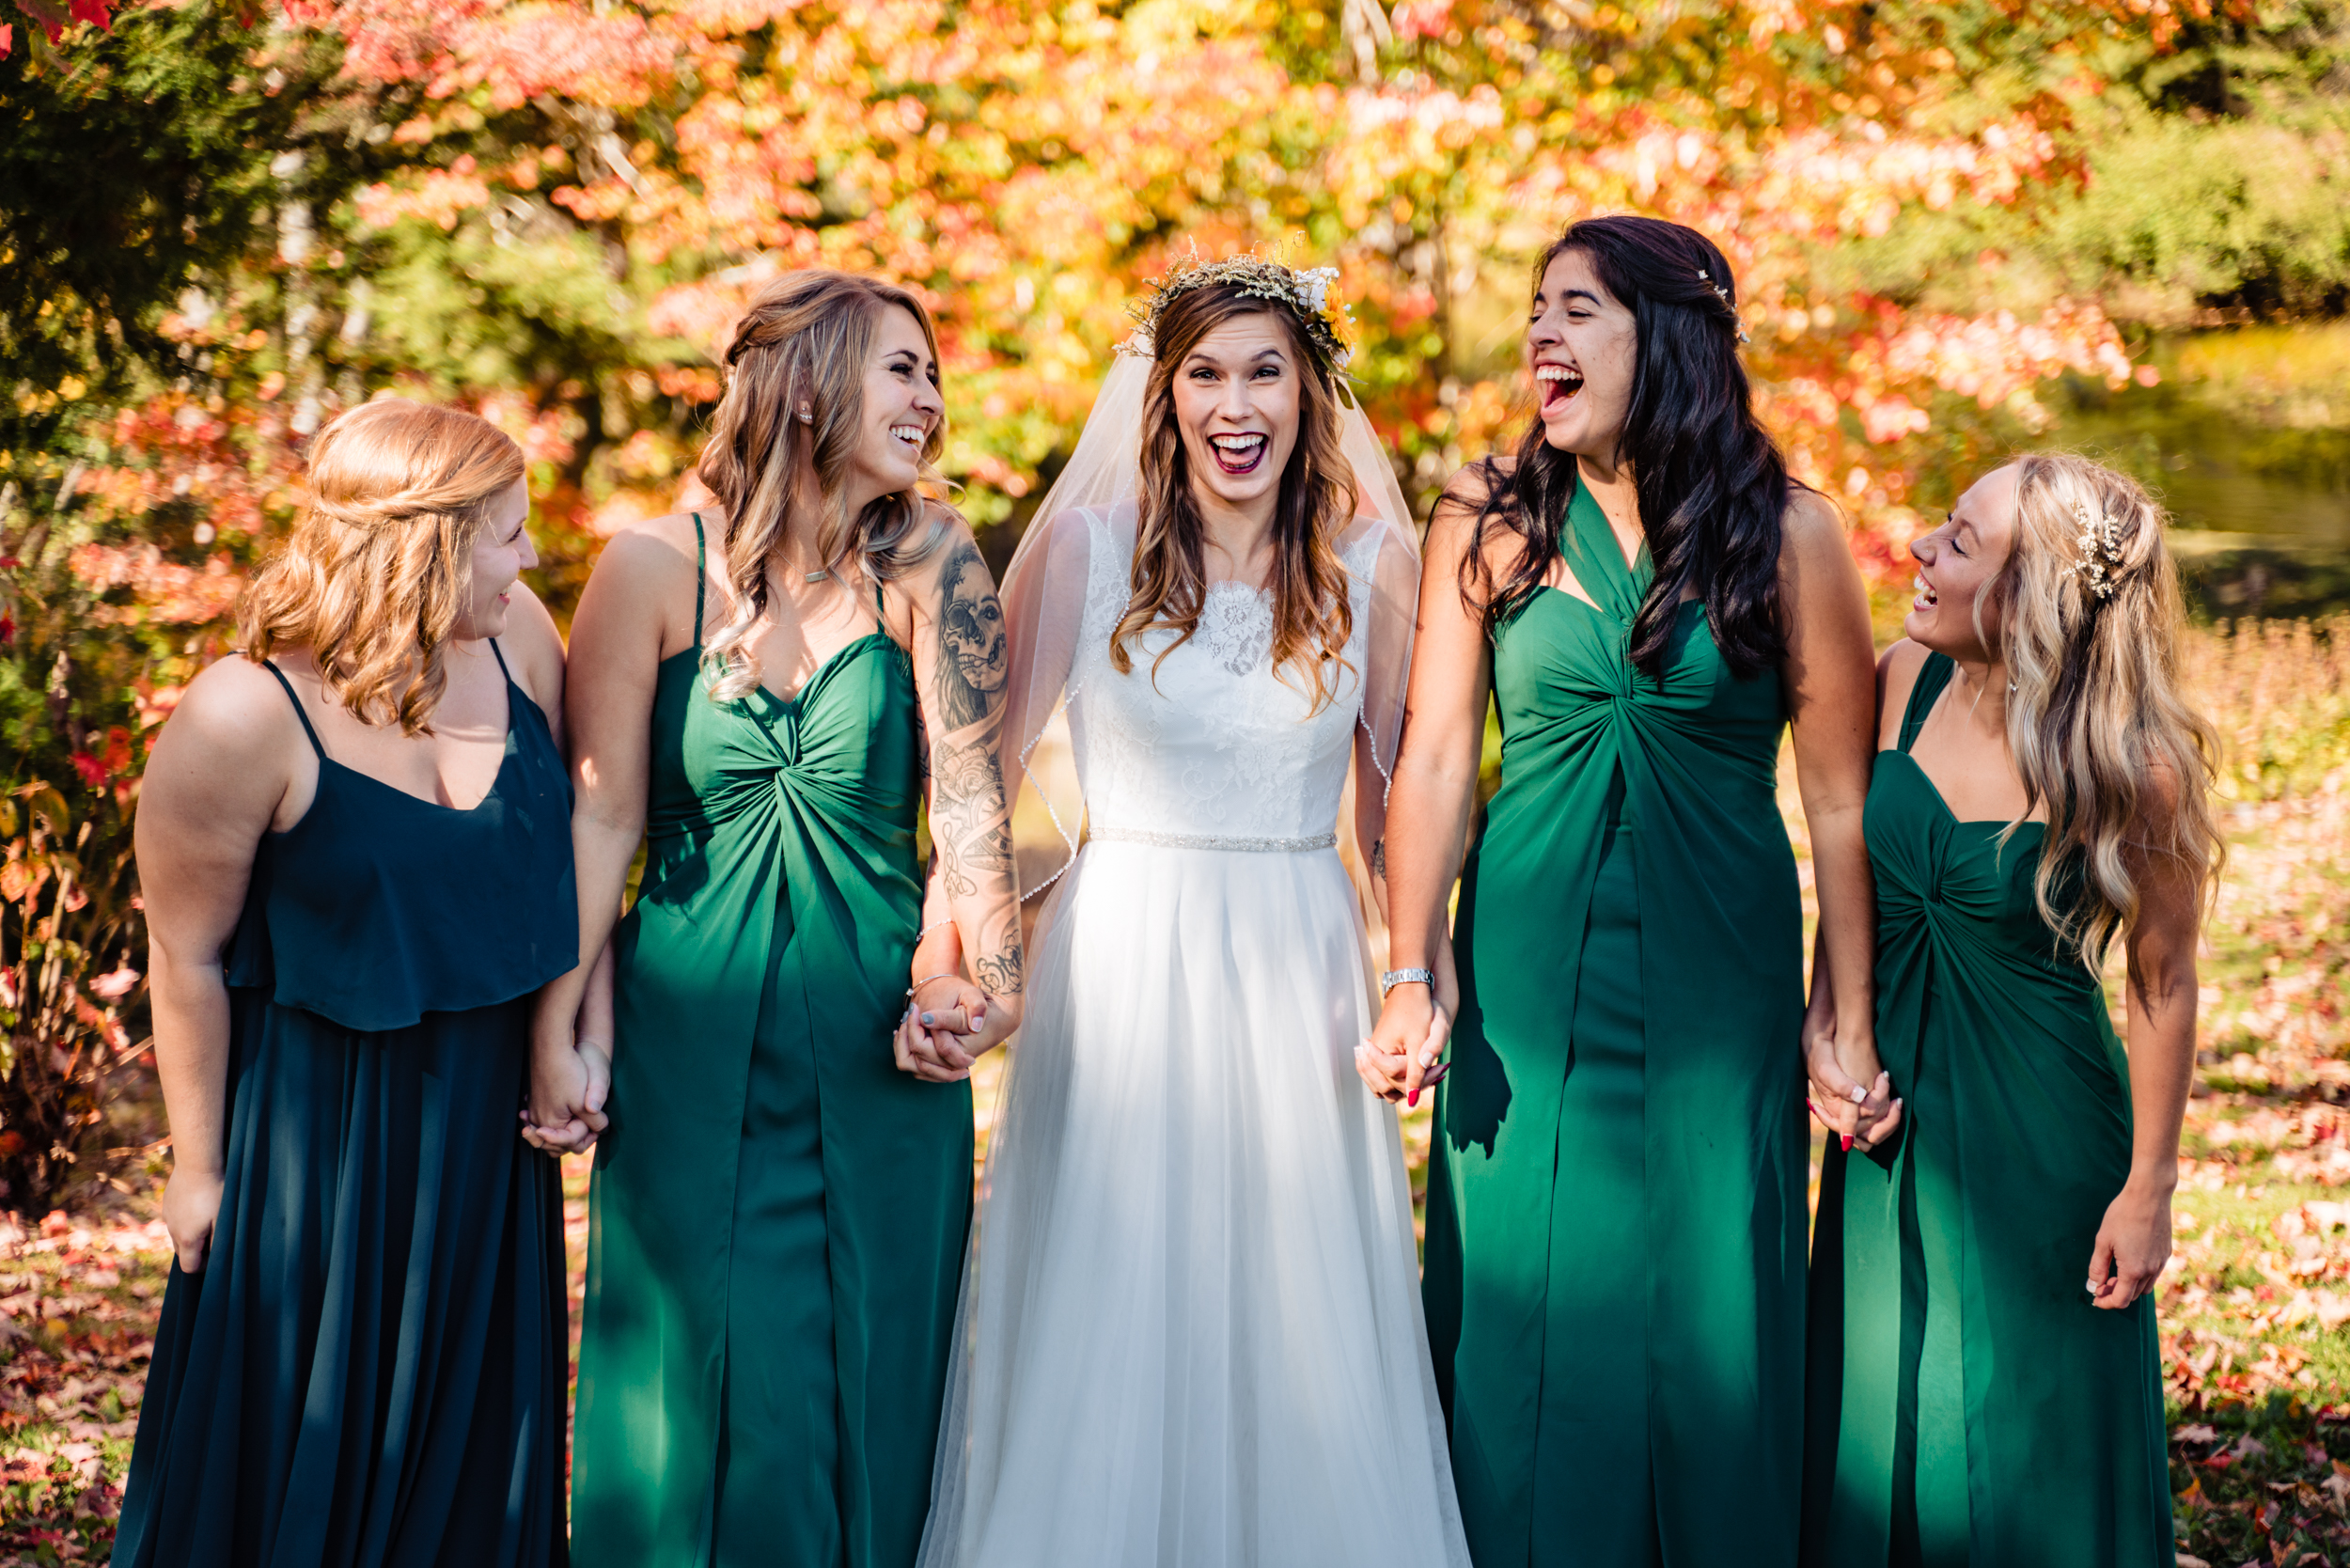 Halifax-wedding-photography-fall-photographers-novascotia-canada-ottawa (6 of 97).jpg